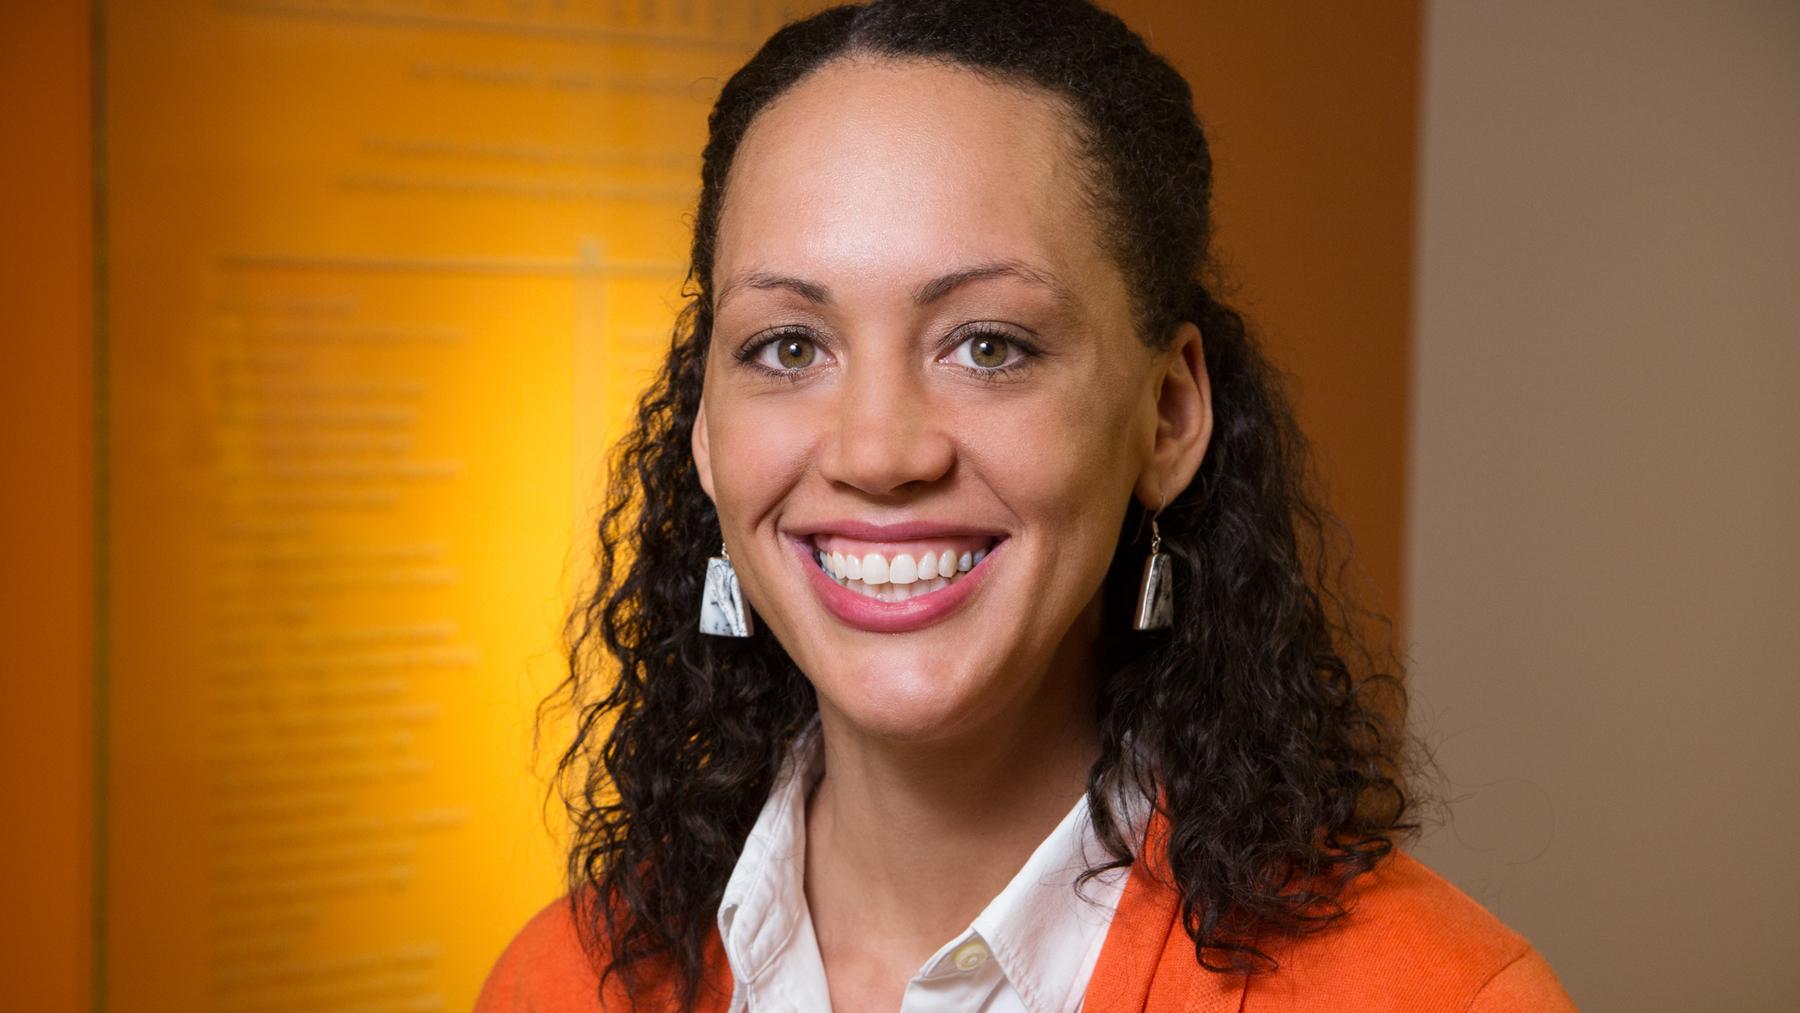 social work professor Karen M. Tabb. Photo by L. B. Stauffer